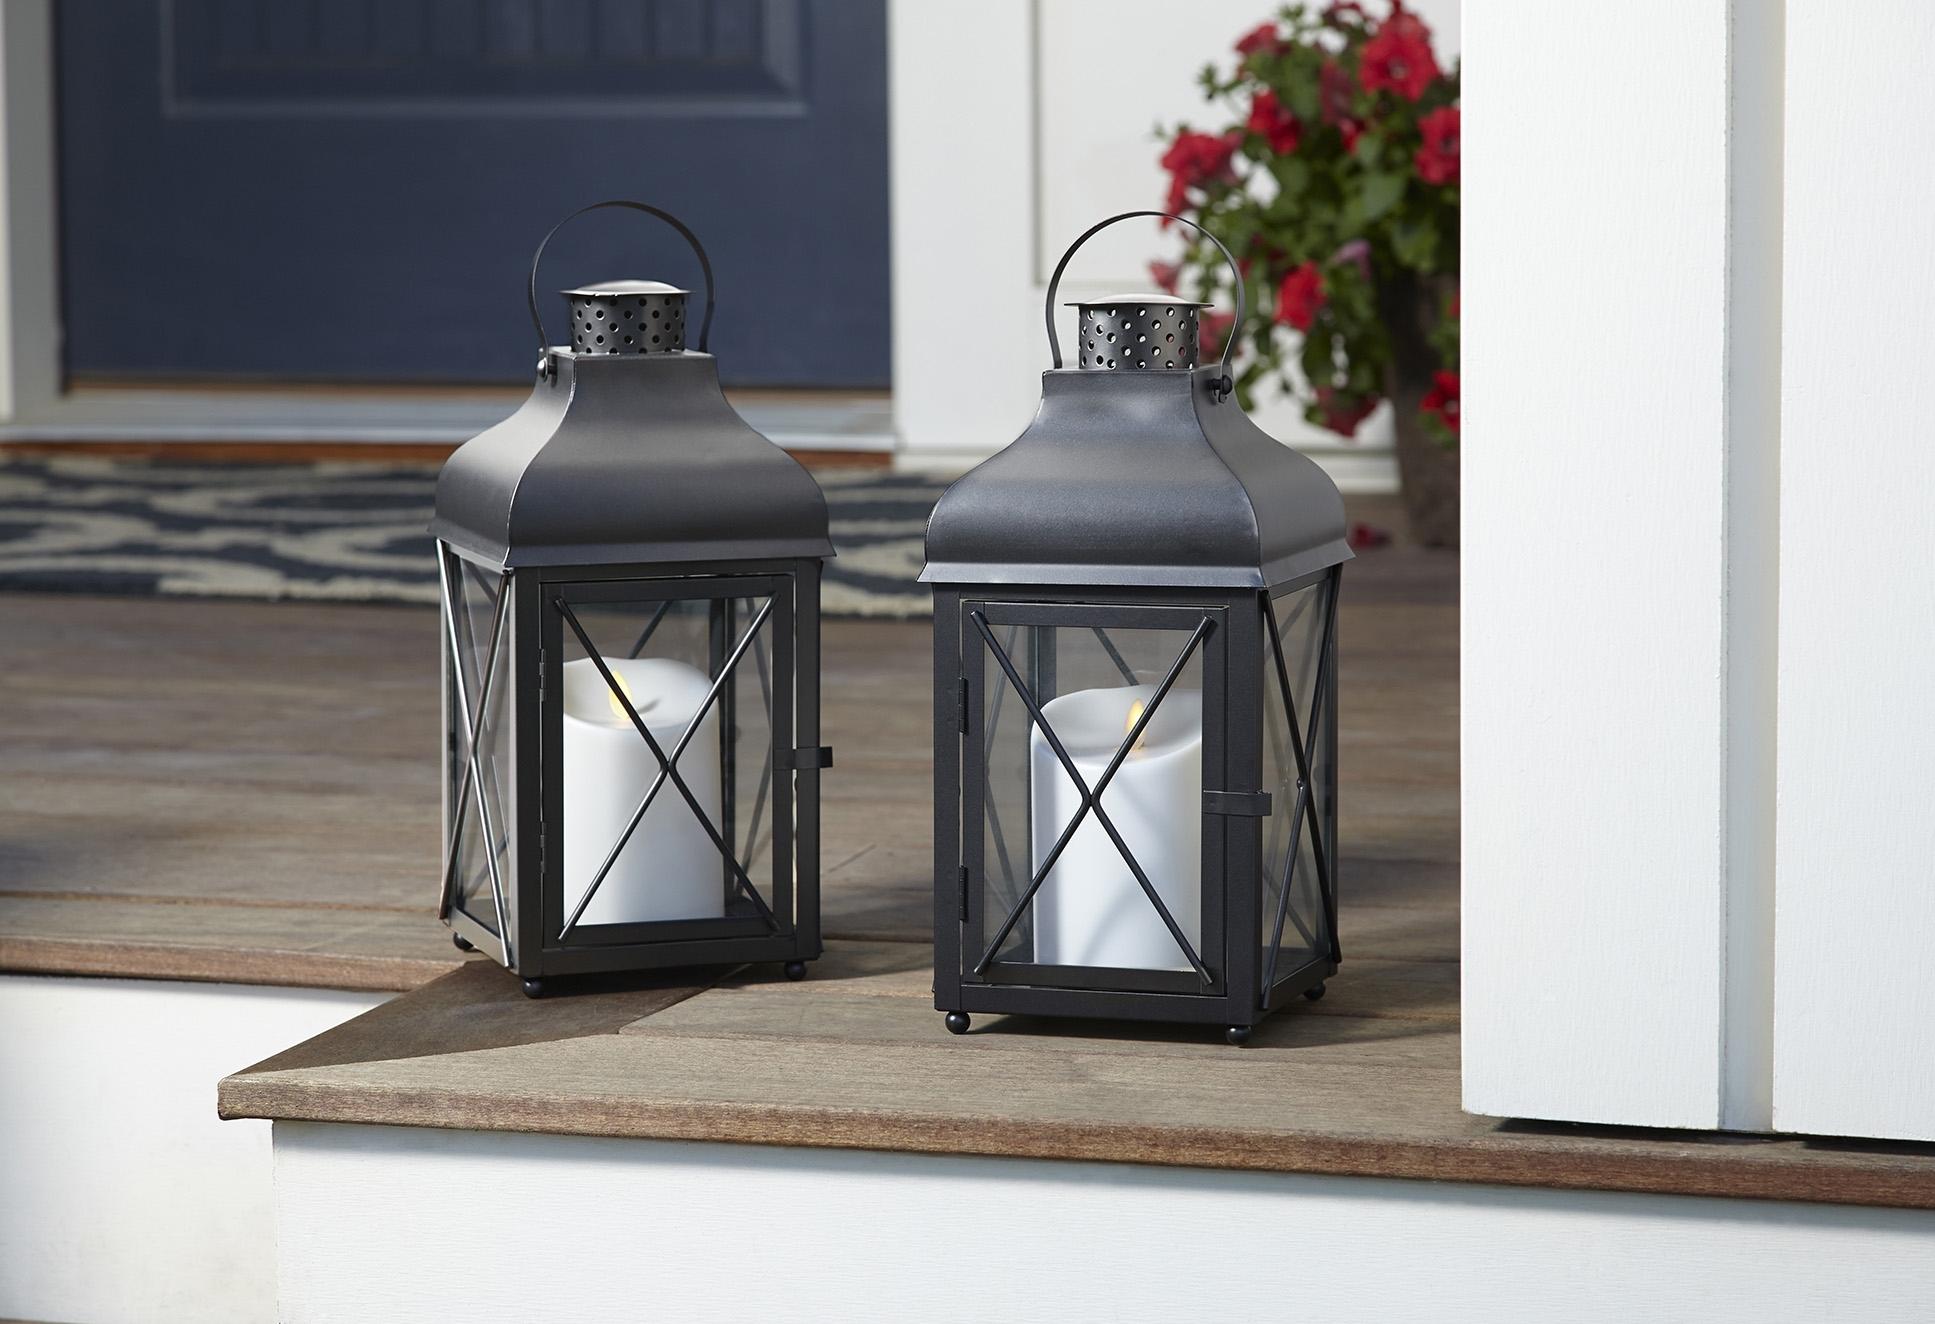 Luminara – Real Flame Effect Candles Inside Outdoor Luminara Lanterns (View 6 of 20)